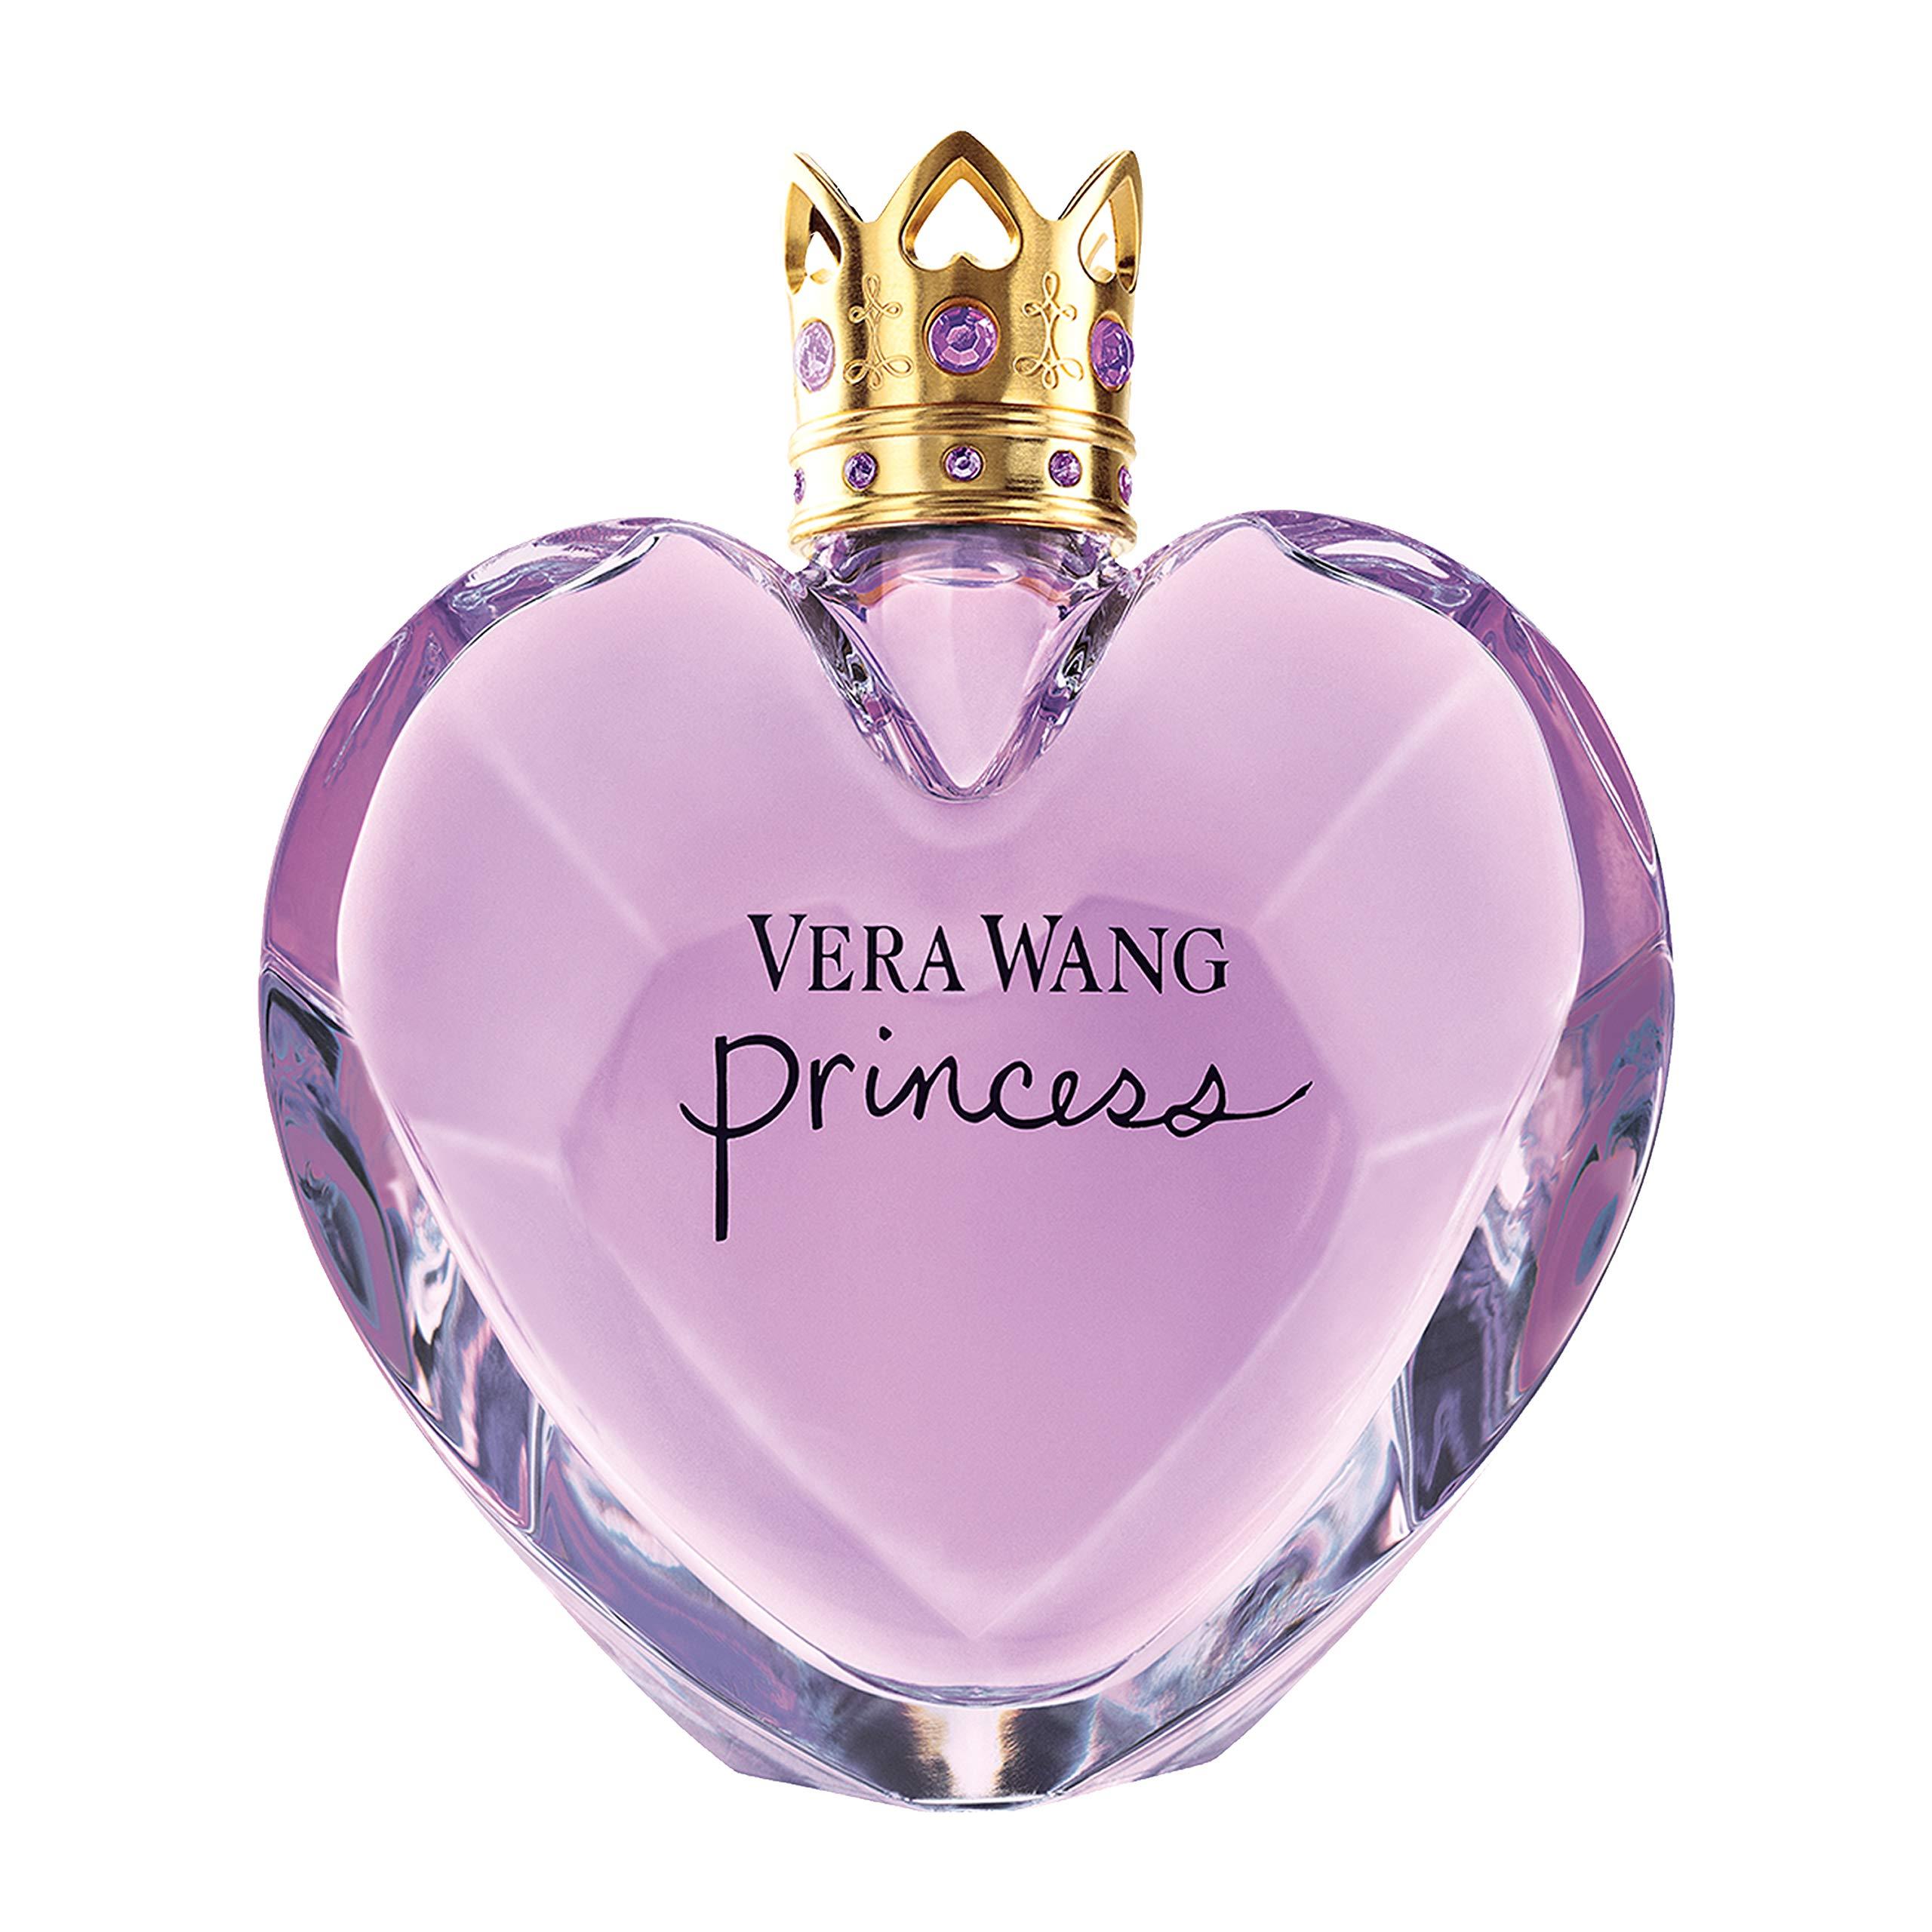 Vera Wang Princess by Vera Wang for Women - 3.4 Ounce EDT Spray by Vera Wang